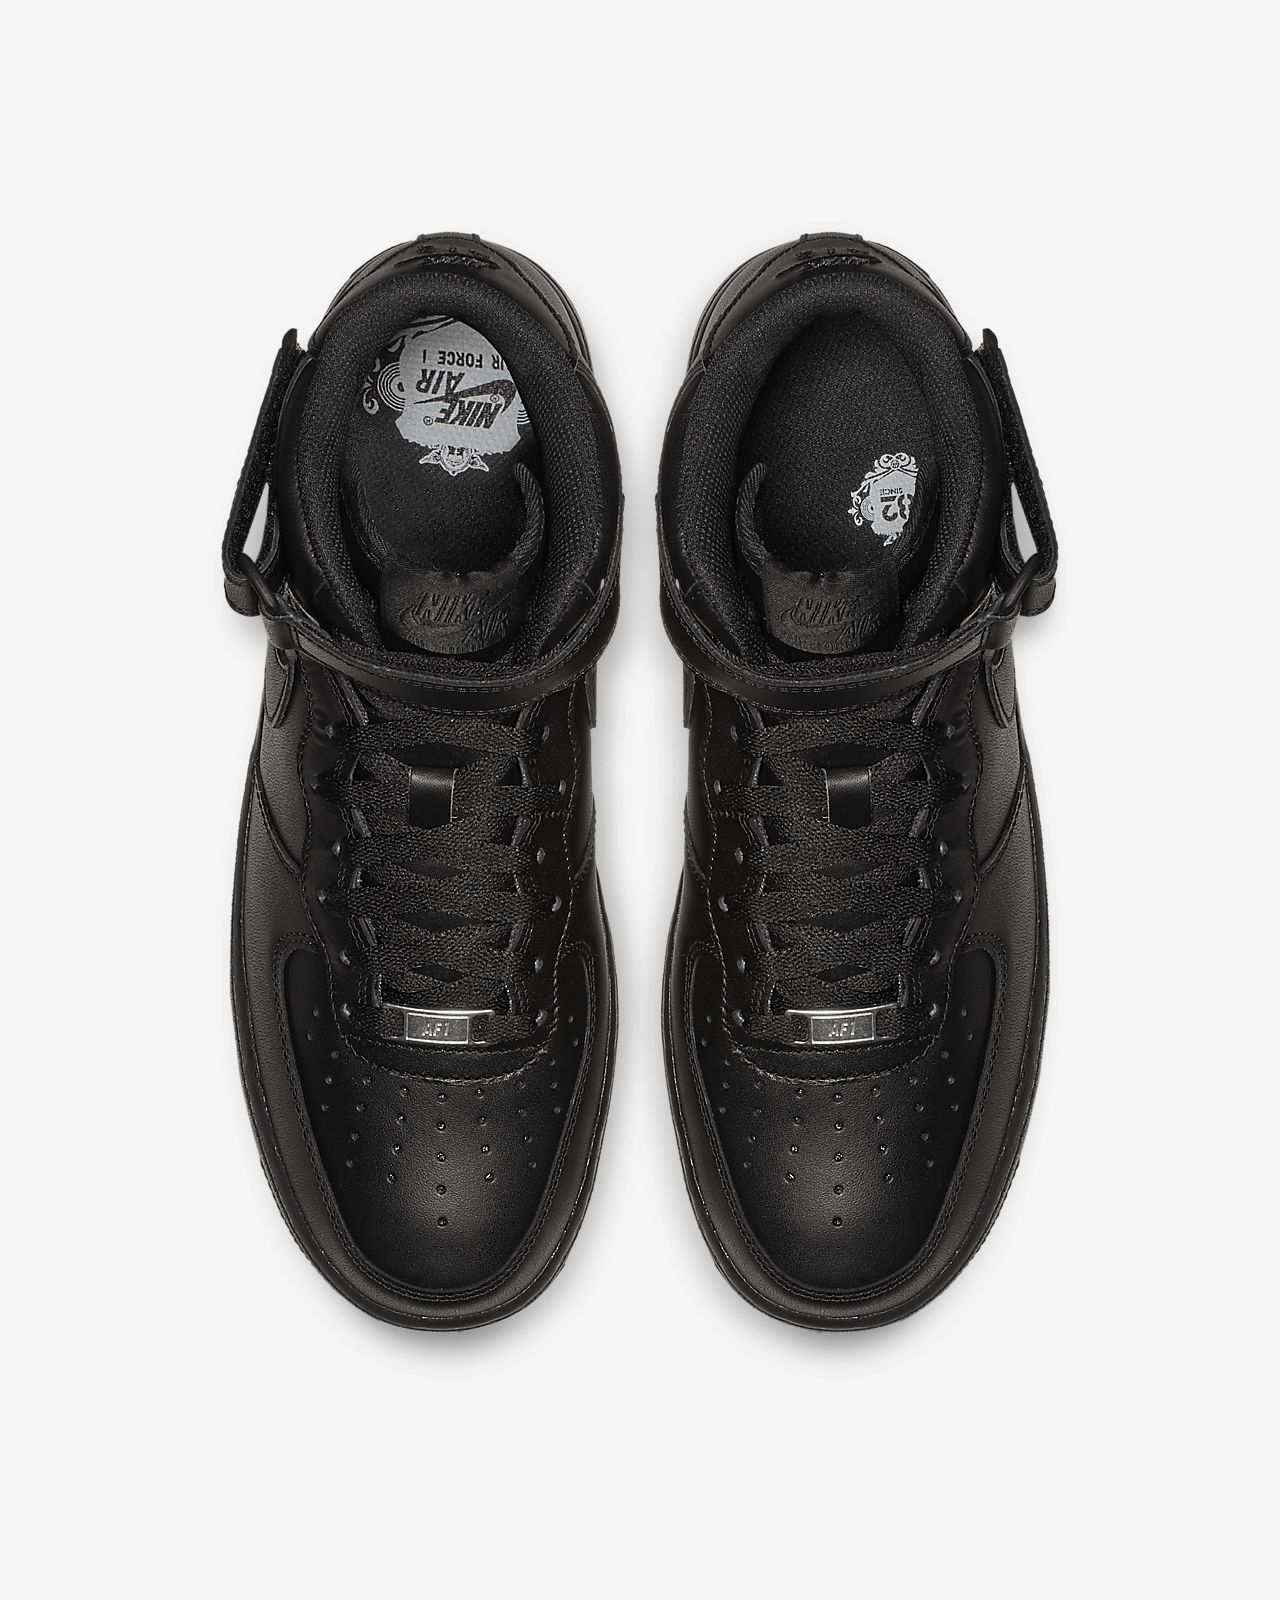 Nike Force 1 Mid '07 WhiteWhite